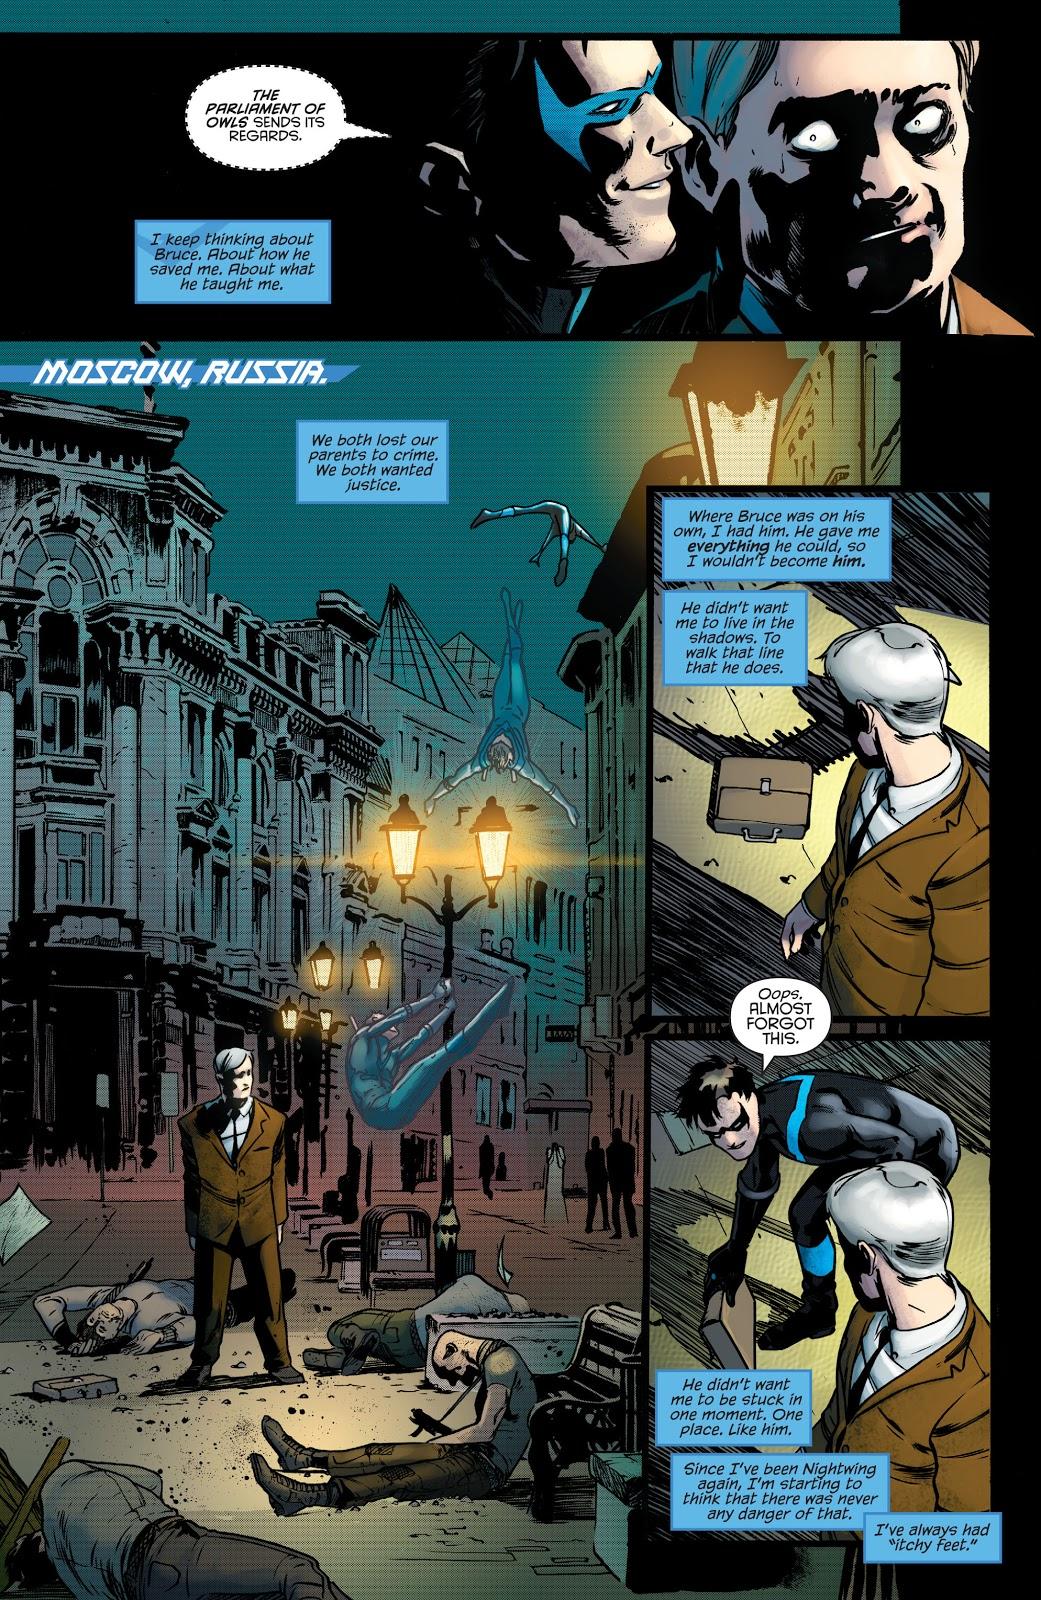 Nightwing Better than Batman review